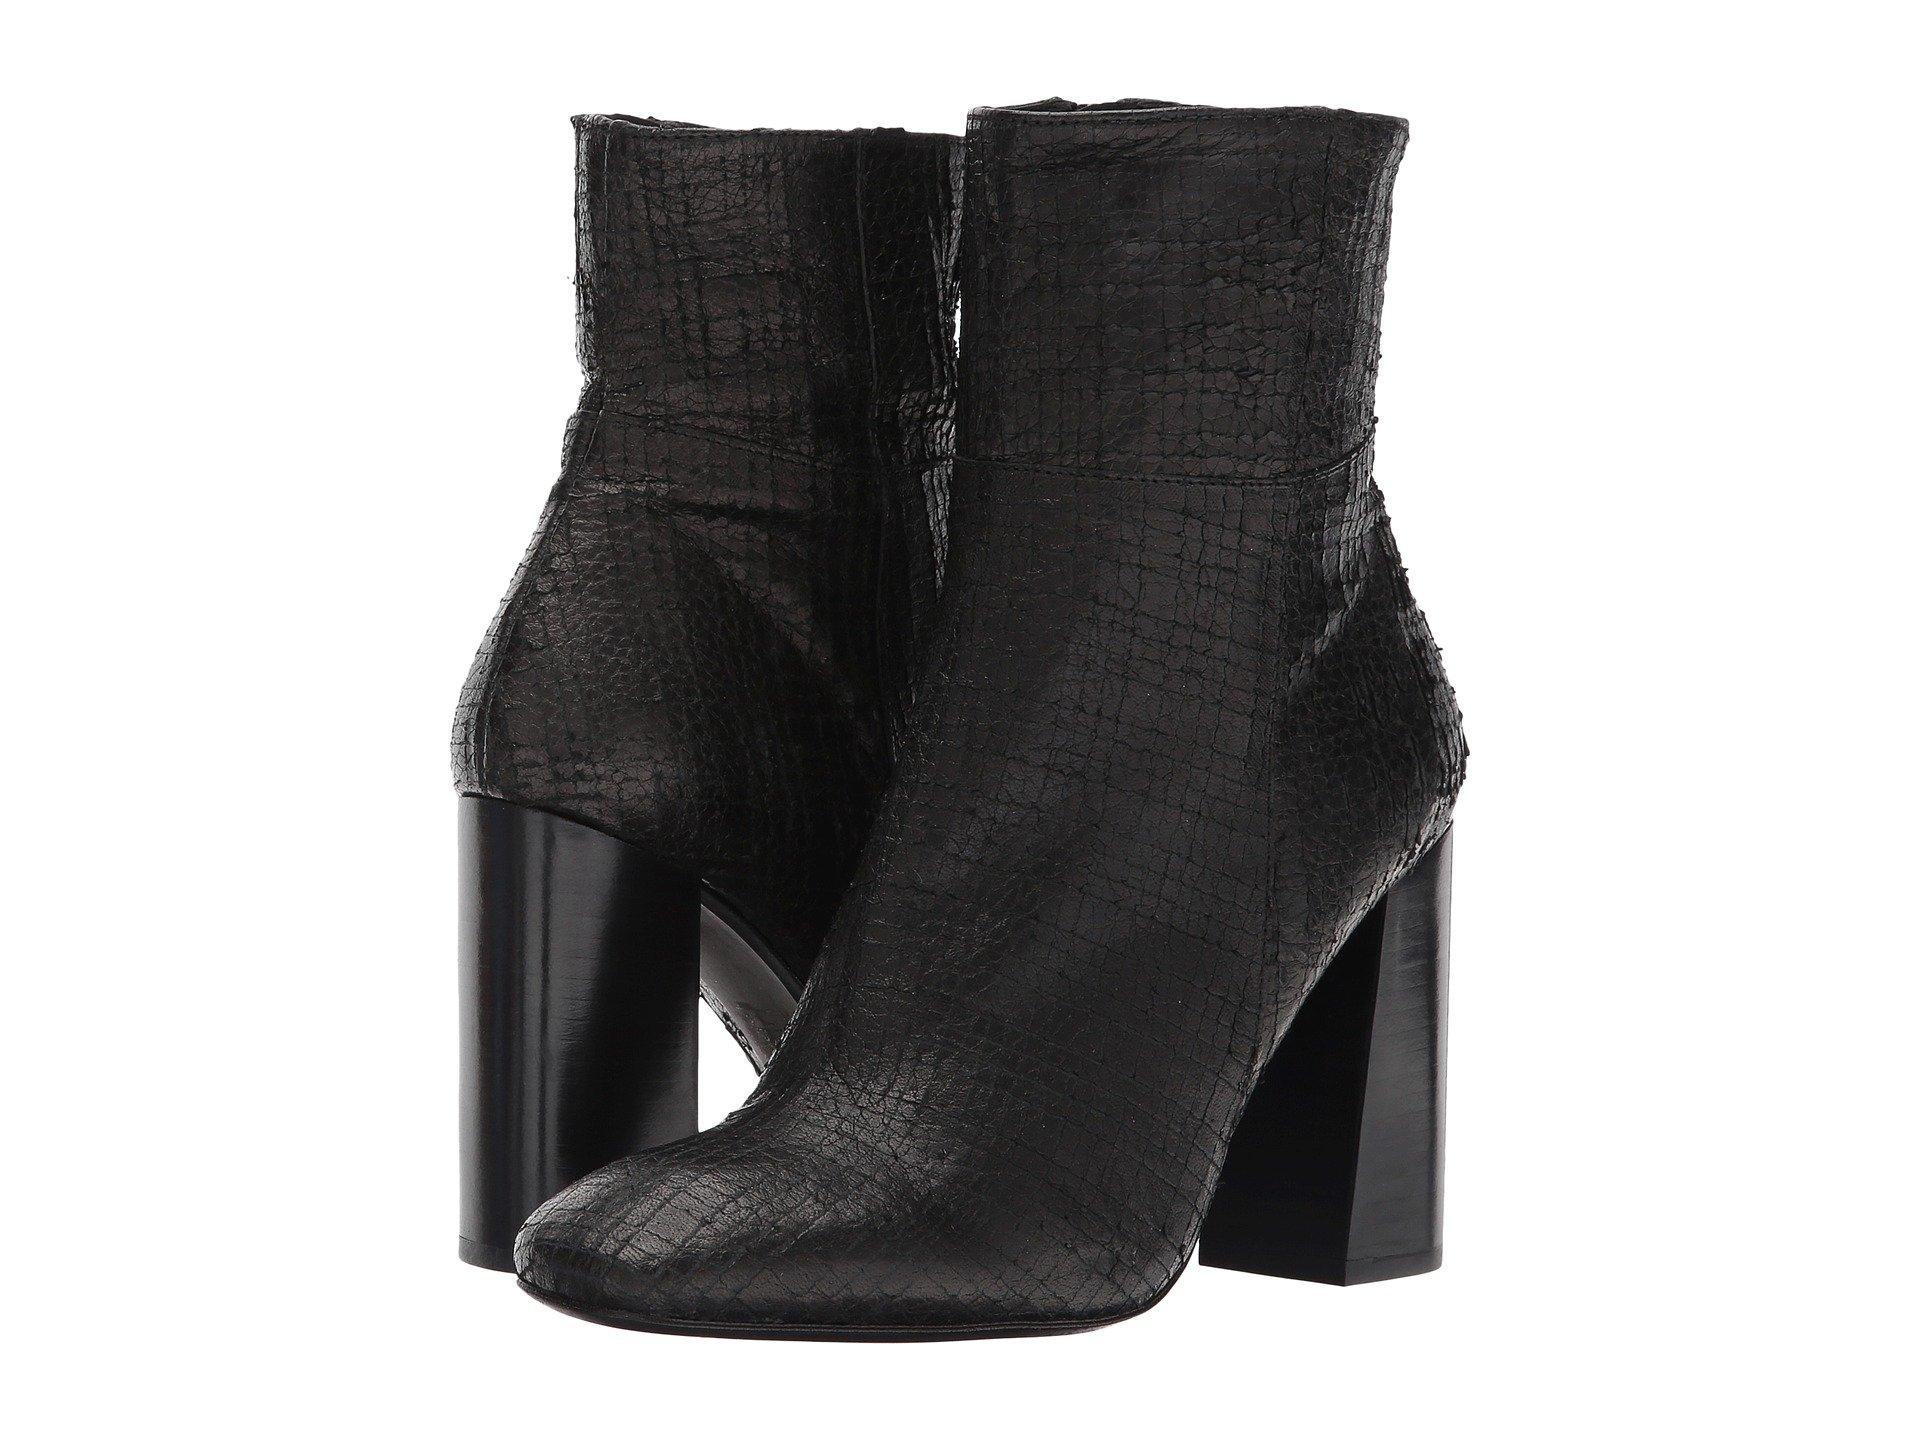 Nolita Ankle Boot